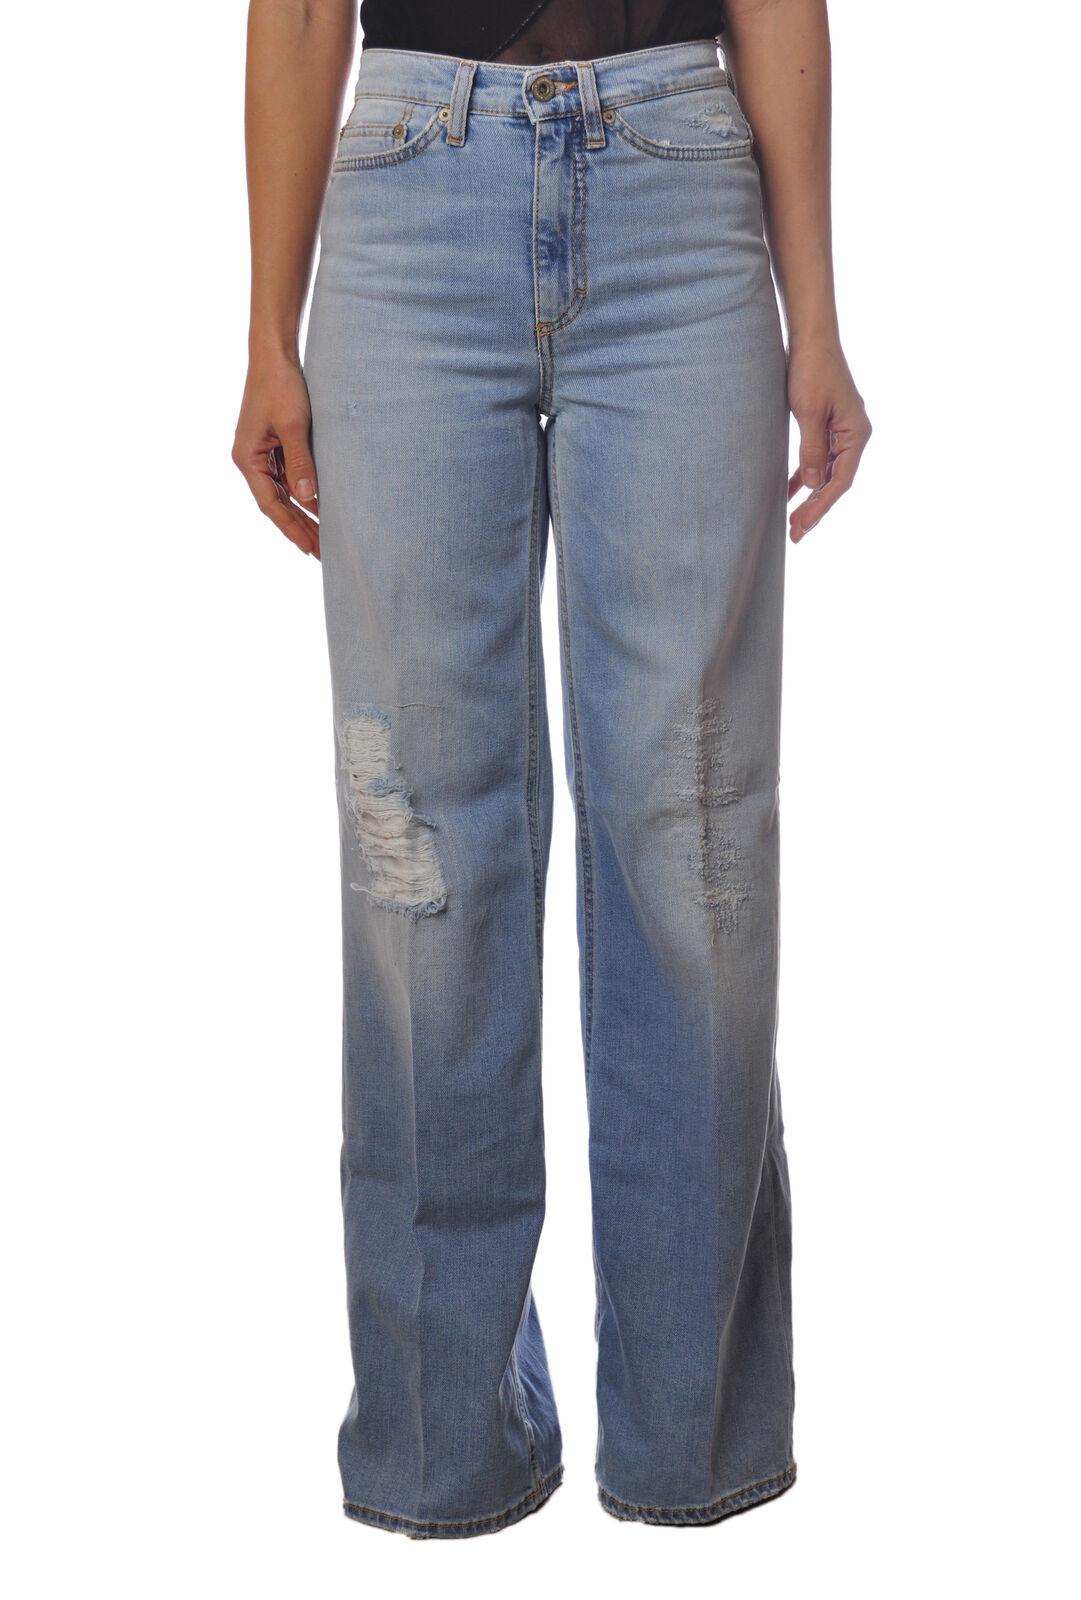 Dondup - Jeans-Pantaloni - women - Denim - 4984726E183740